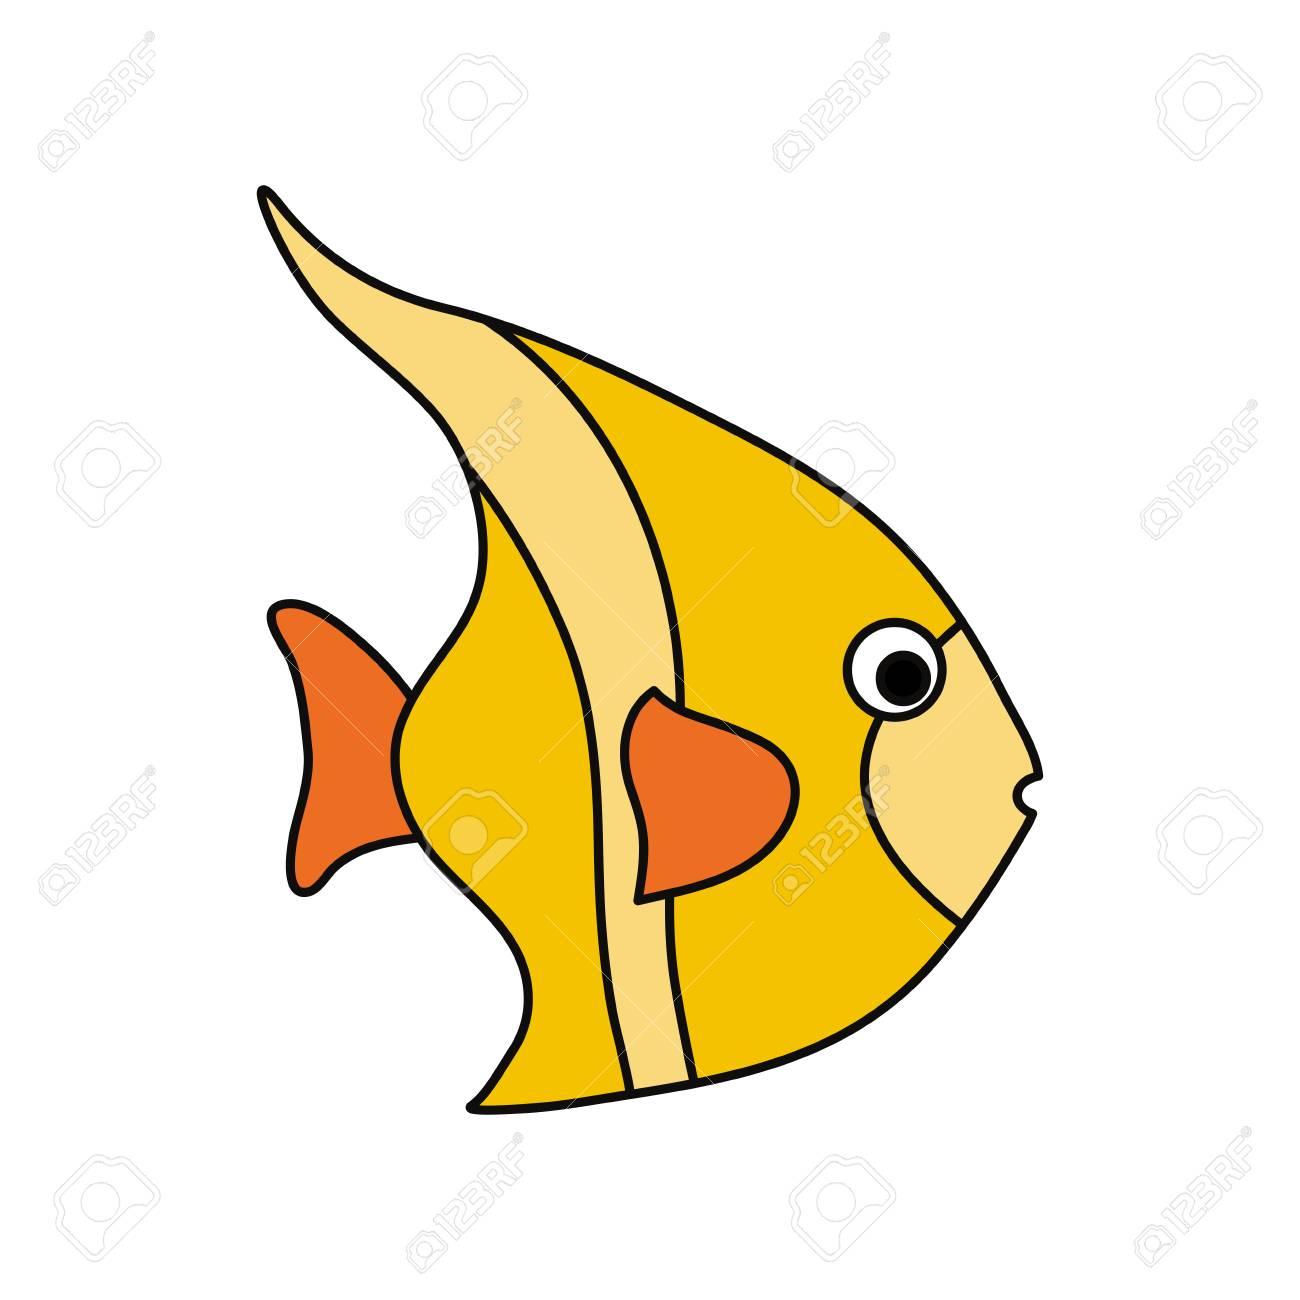 cute fish cartoon icon vector illustration graphic design royalty rh 123rf com cute fish cartoon images funny fish cartoon